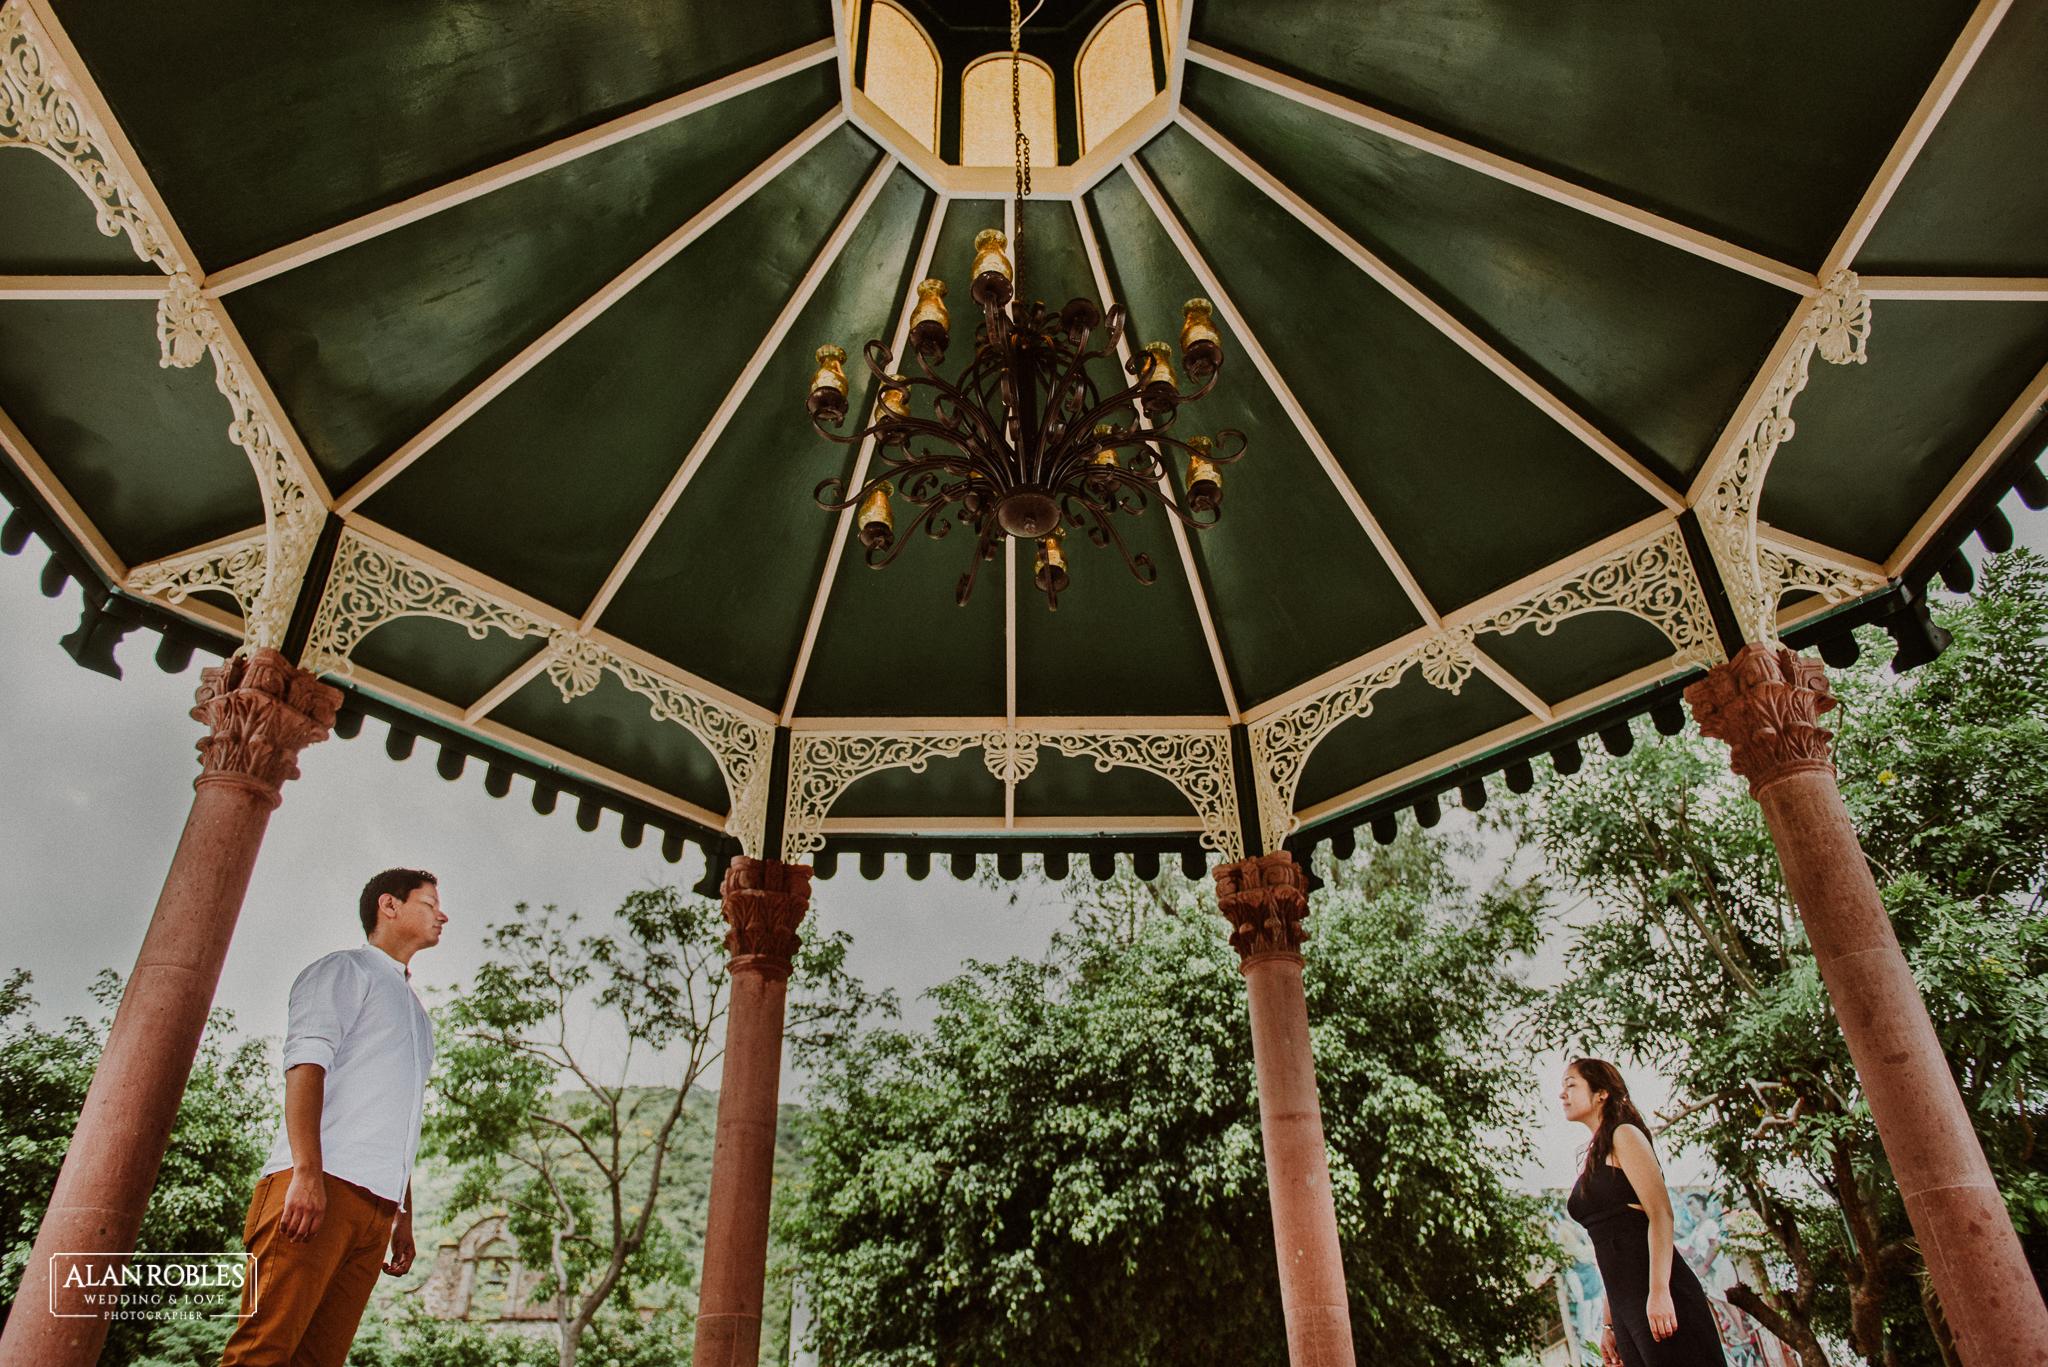 Sesion de fotos Preboda en Laguna de Cajititlan. Fotografia de bodas - Alan Robles Wedding & Love Photographer, Fotografo de bodas en Guadalajara. Fotos creativas para boda. Ideas para fotos de boda. Quisco en plaza de Ajijic.